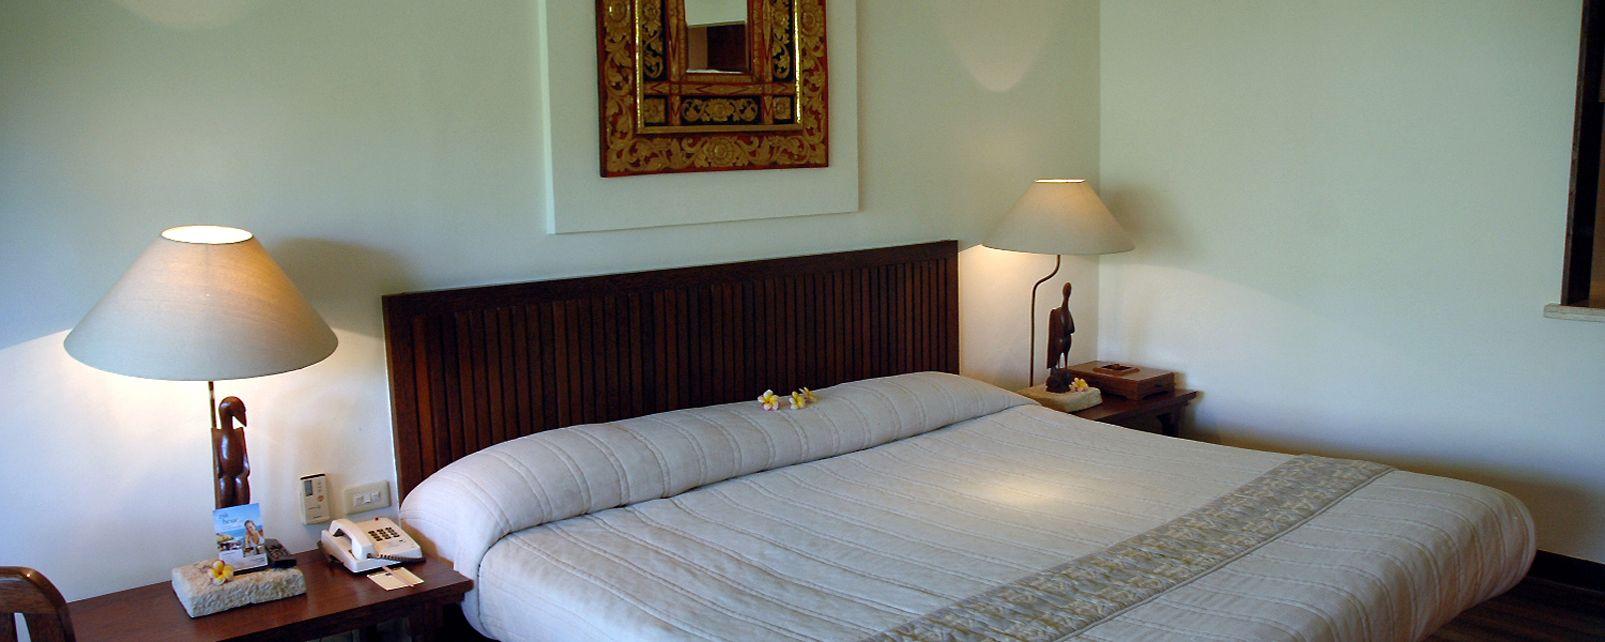 Hotel Novotel Benoa Bali